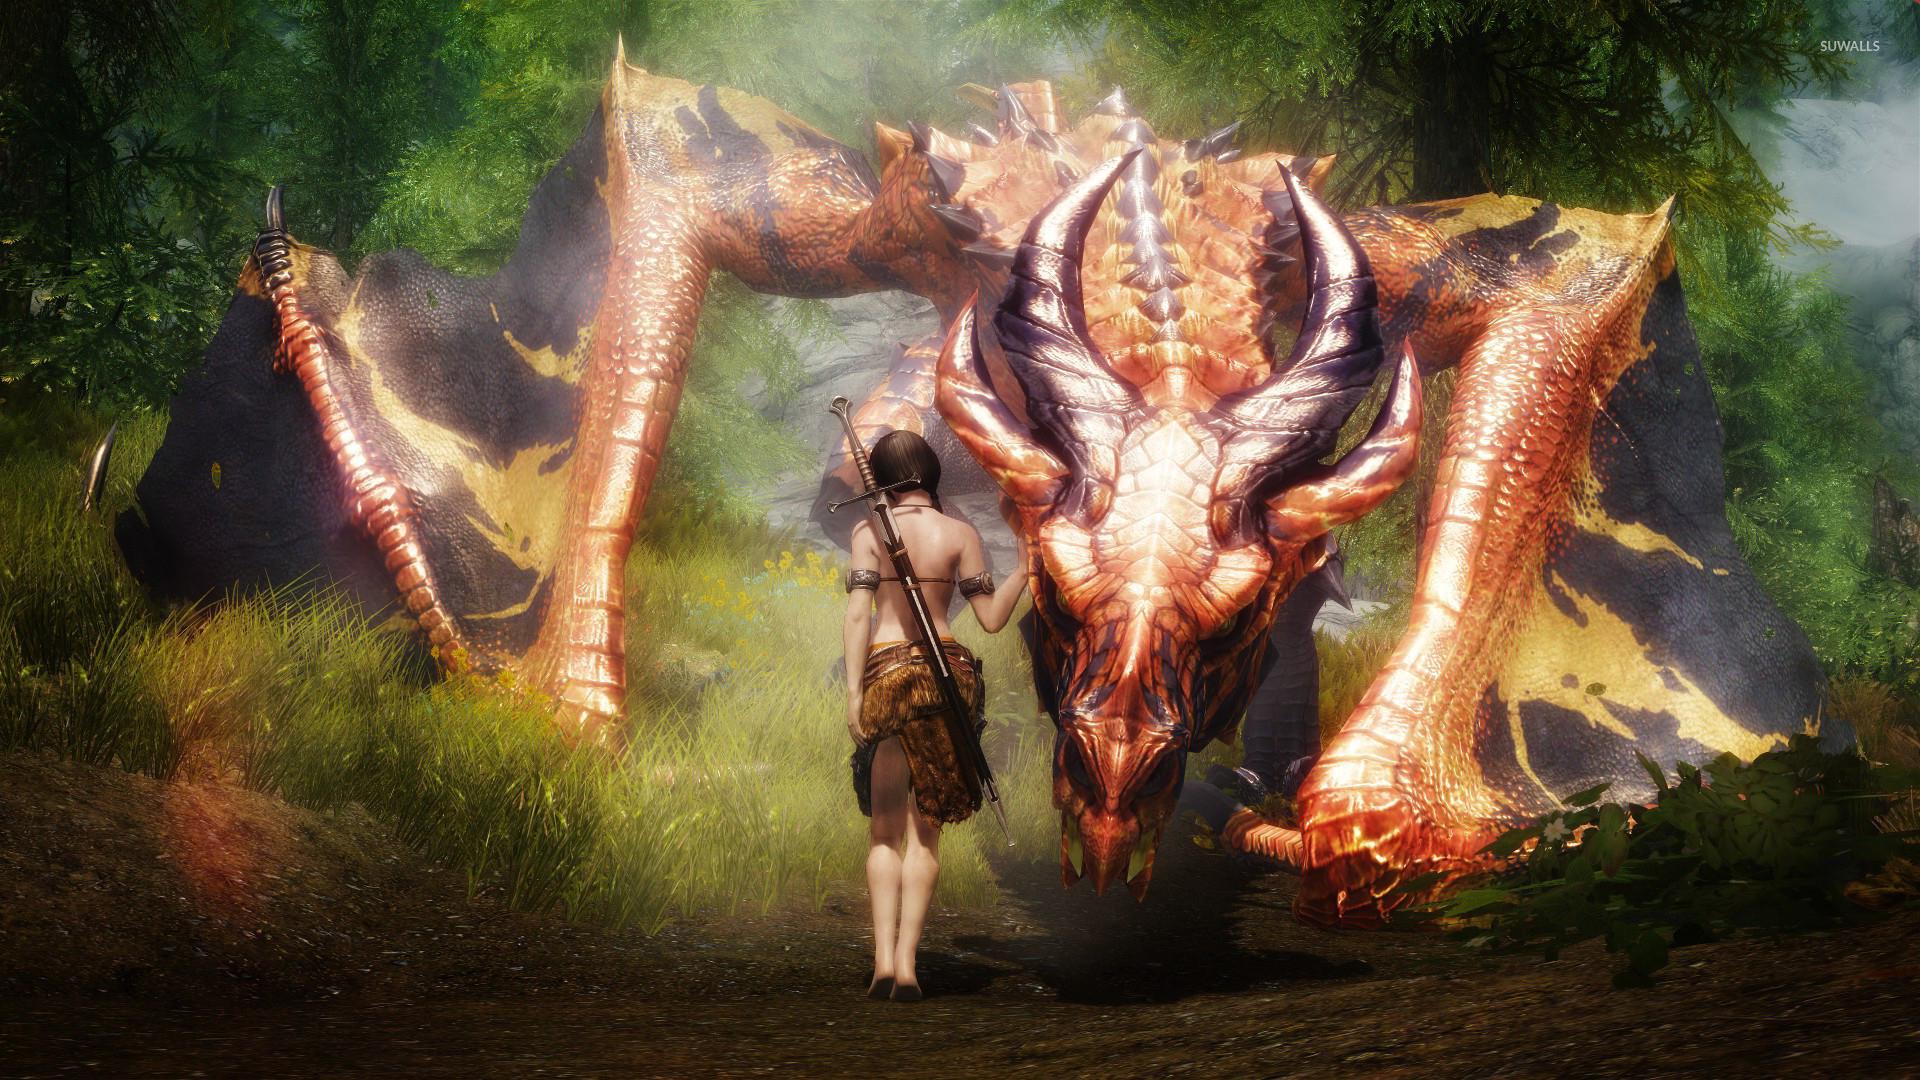 Epic dragon wallpaper dump – Album on Imgur